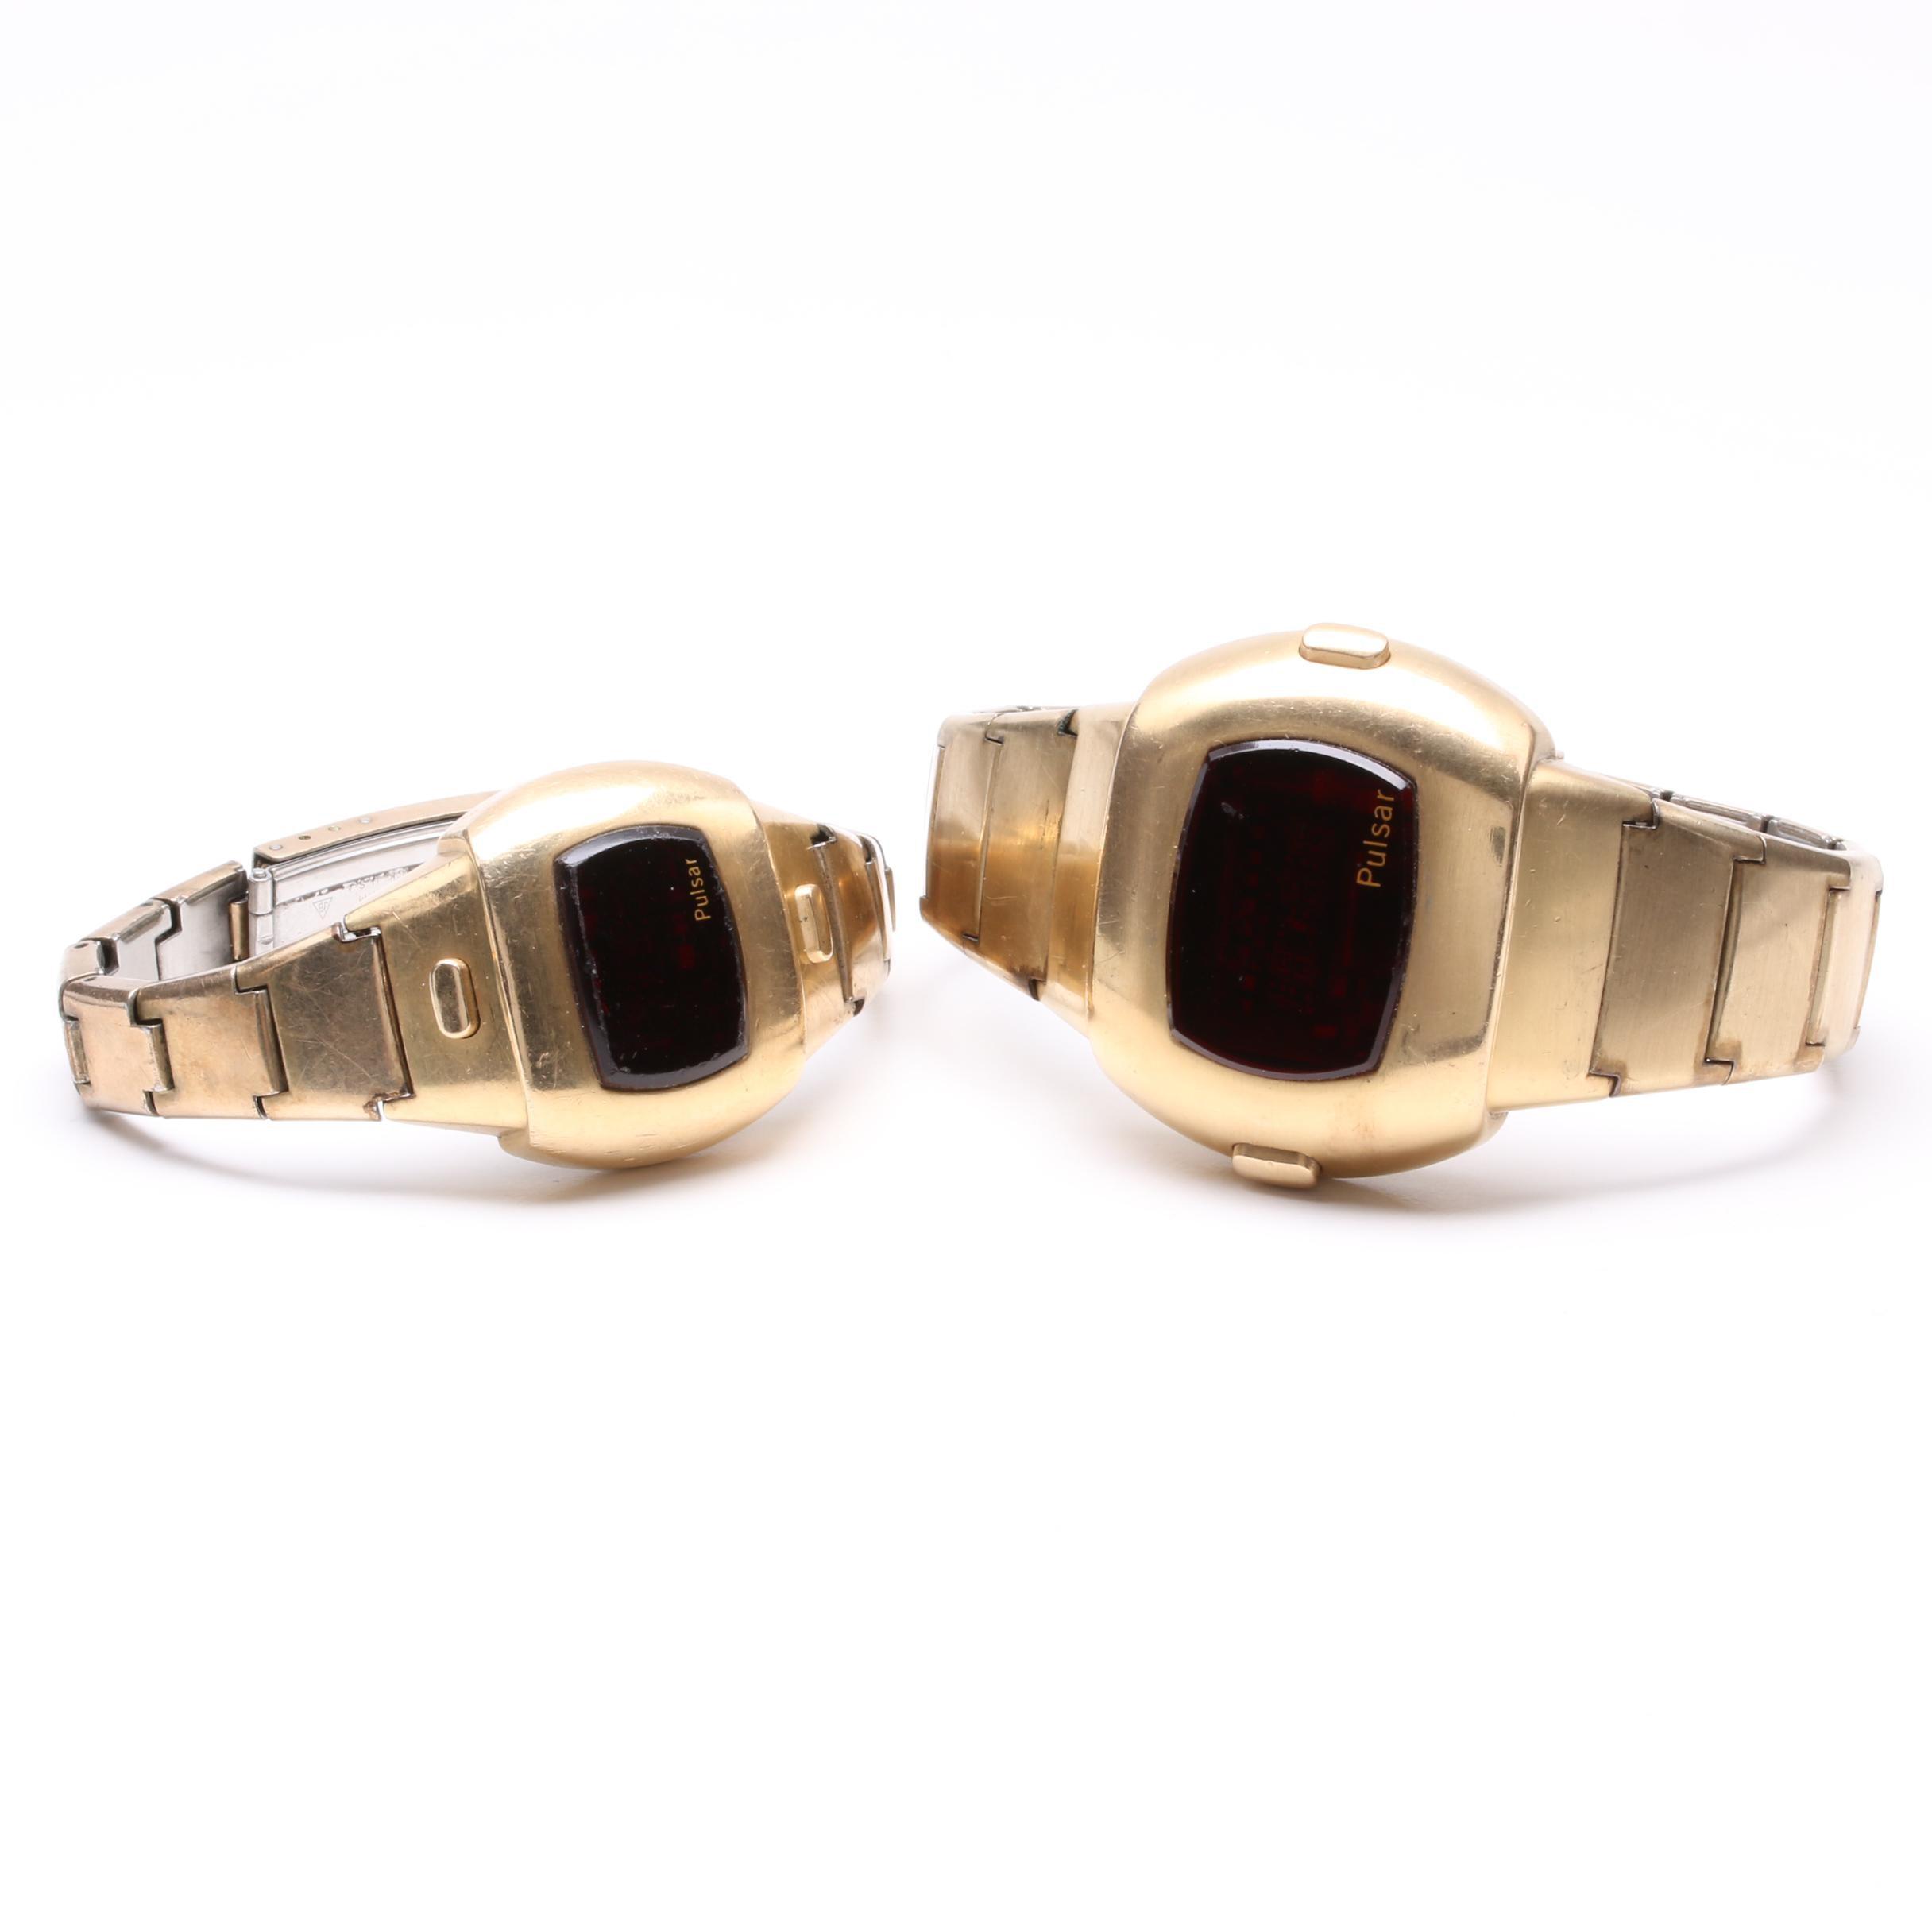 Pulsar Gold Tone L.E.D. Time Computer Wristwatch Selection